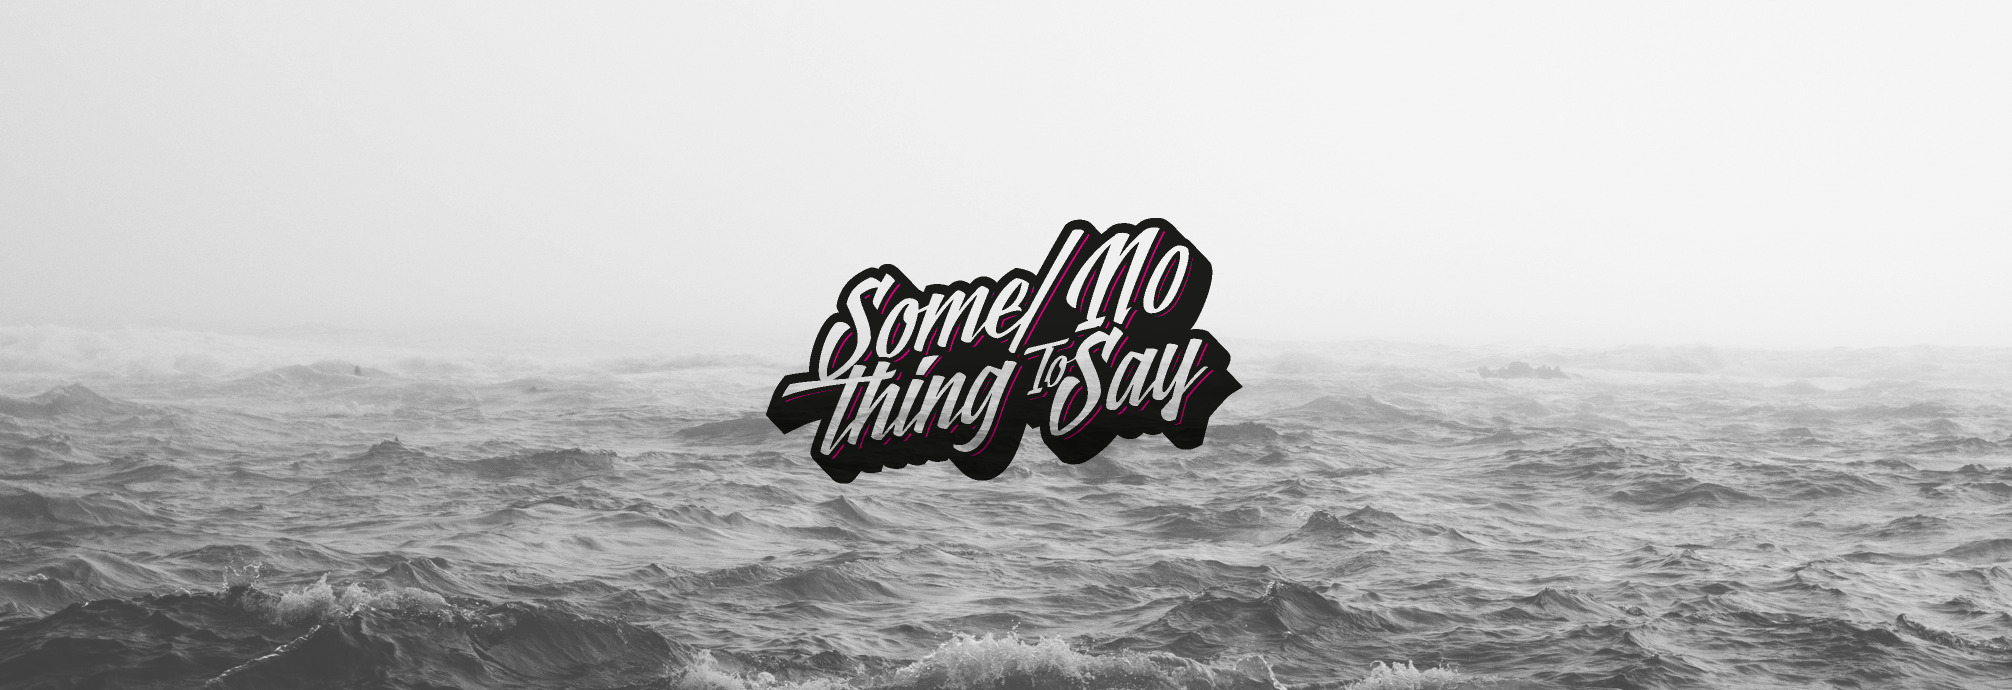 SOM/ENOTHINGTO (@somenothingtosay) Cover Image